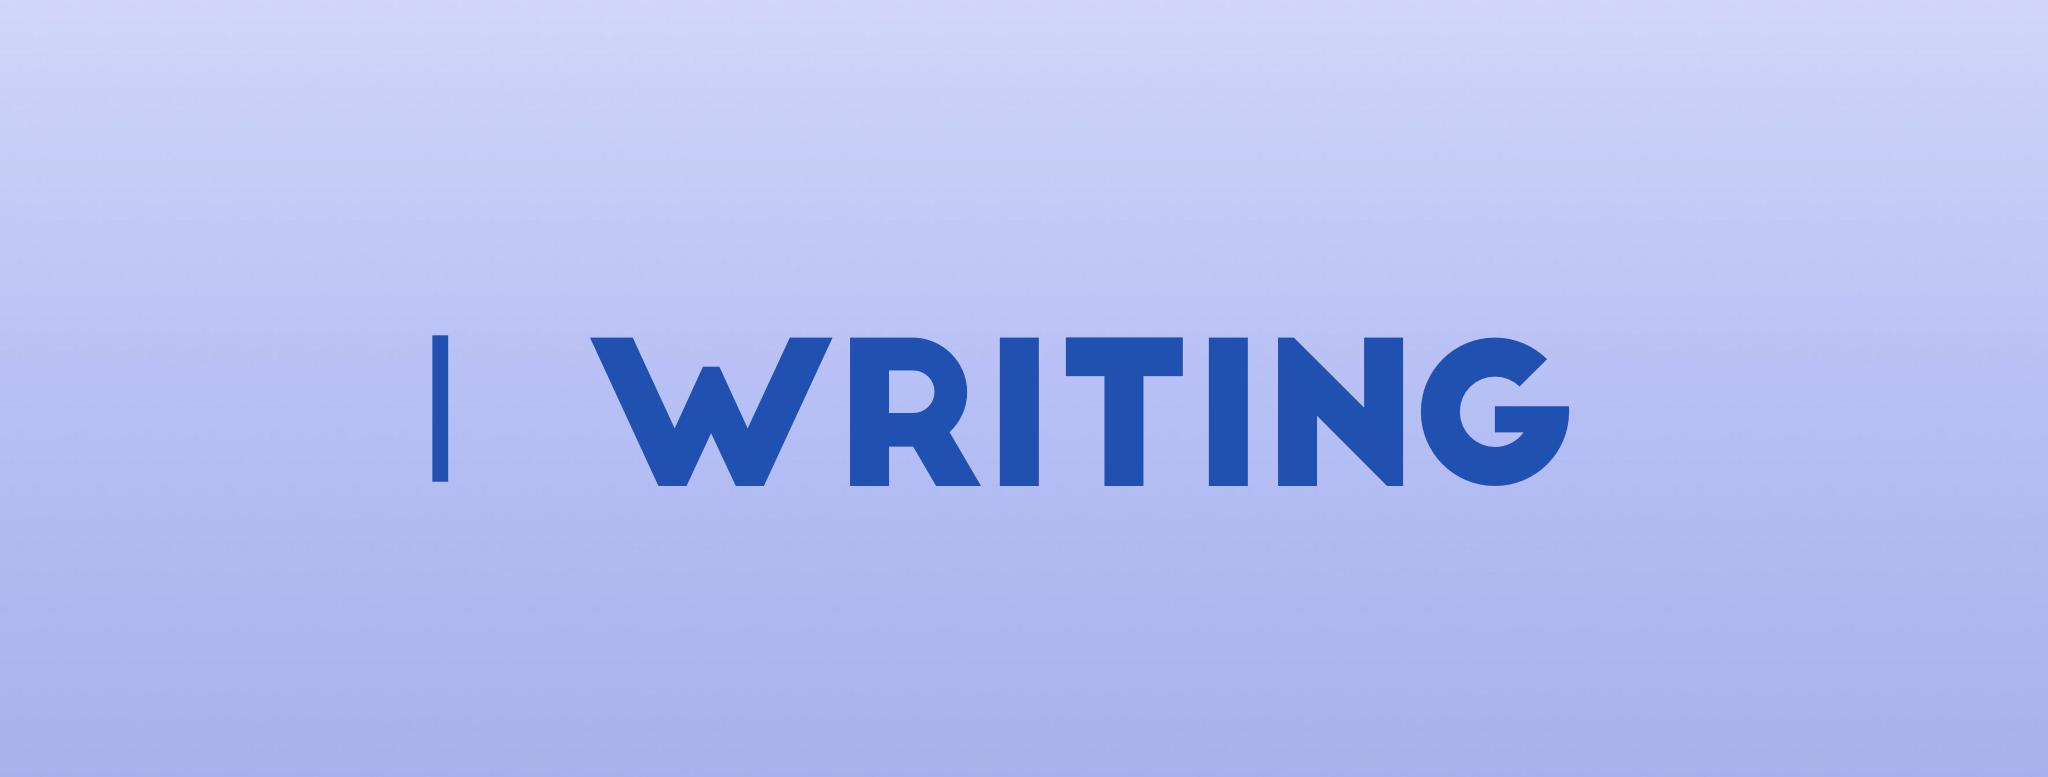 Pin By Lavida Chapman On Writing